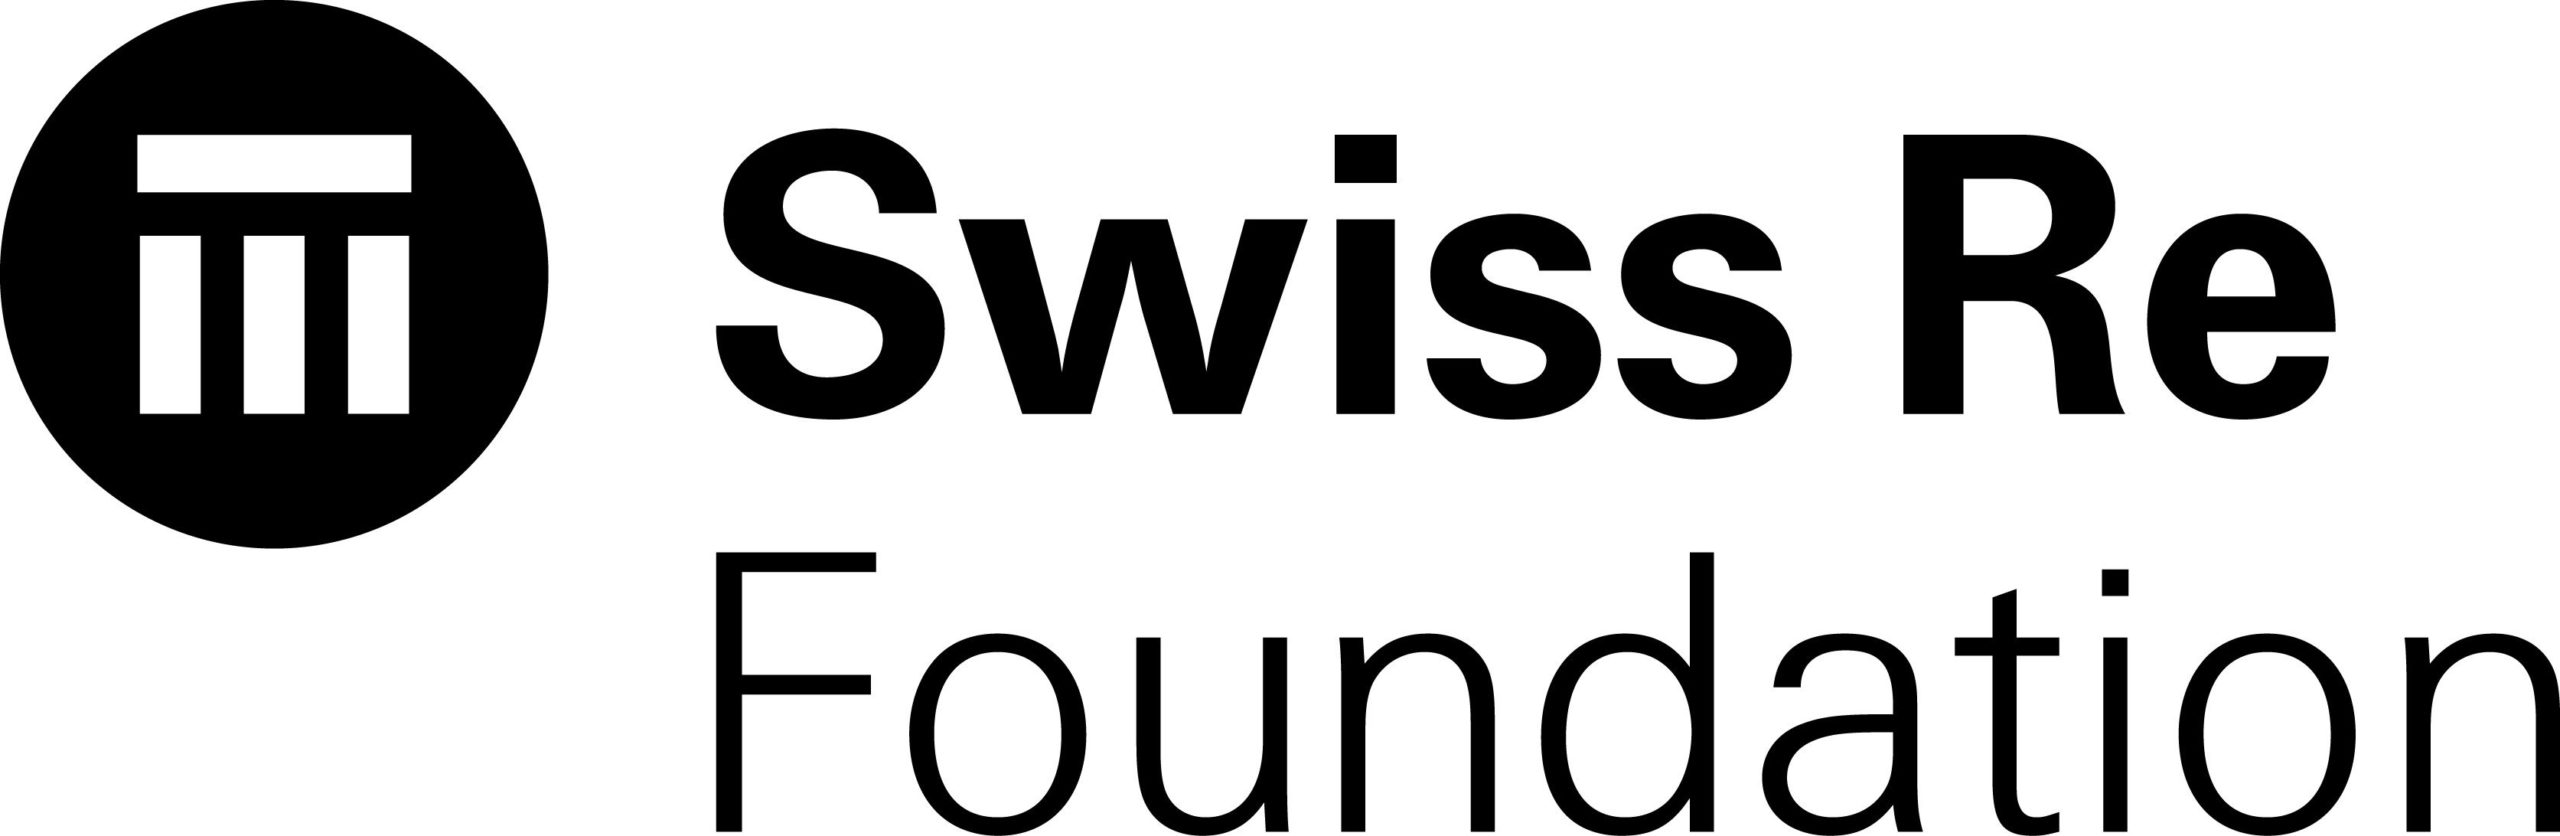 SwissRe_Foundation_logo_BLK